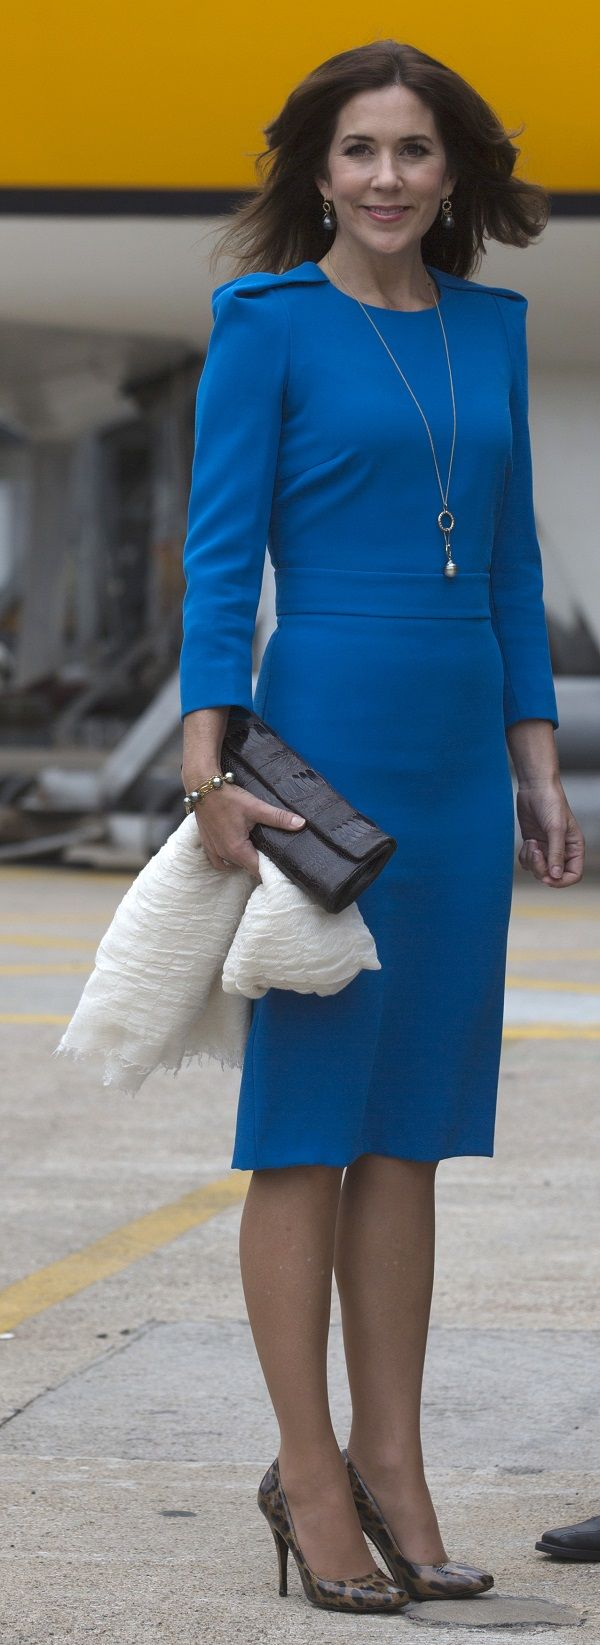 Pompes Ladies Bleu Marine / Bleu Madeleine iwwWW8